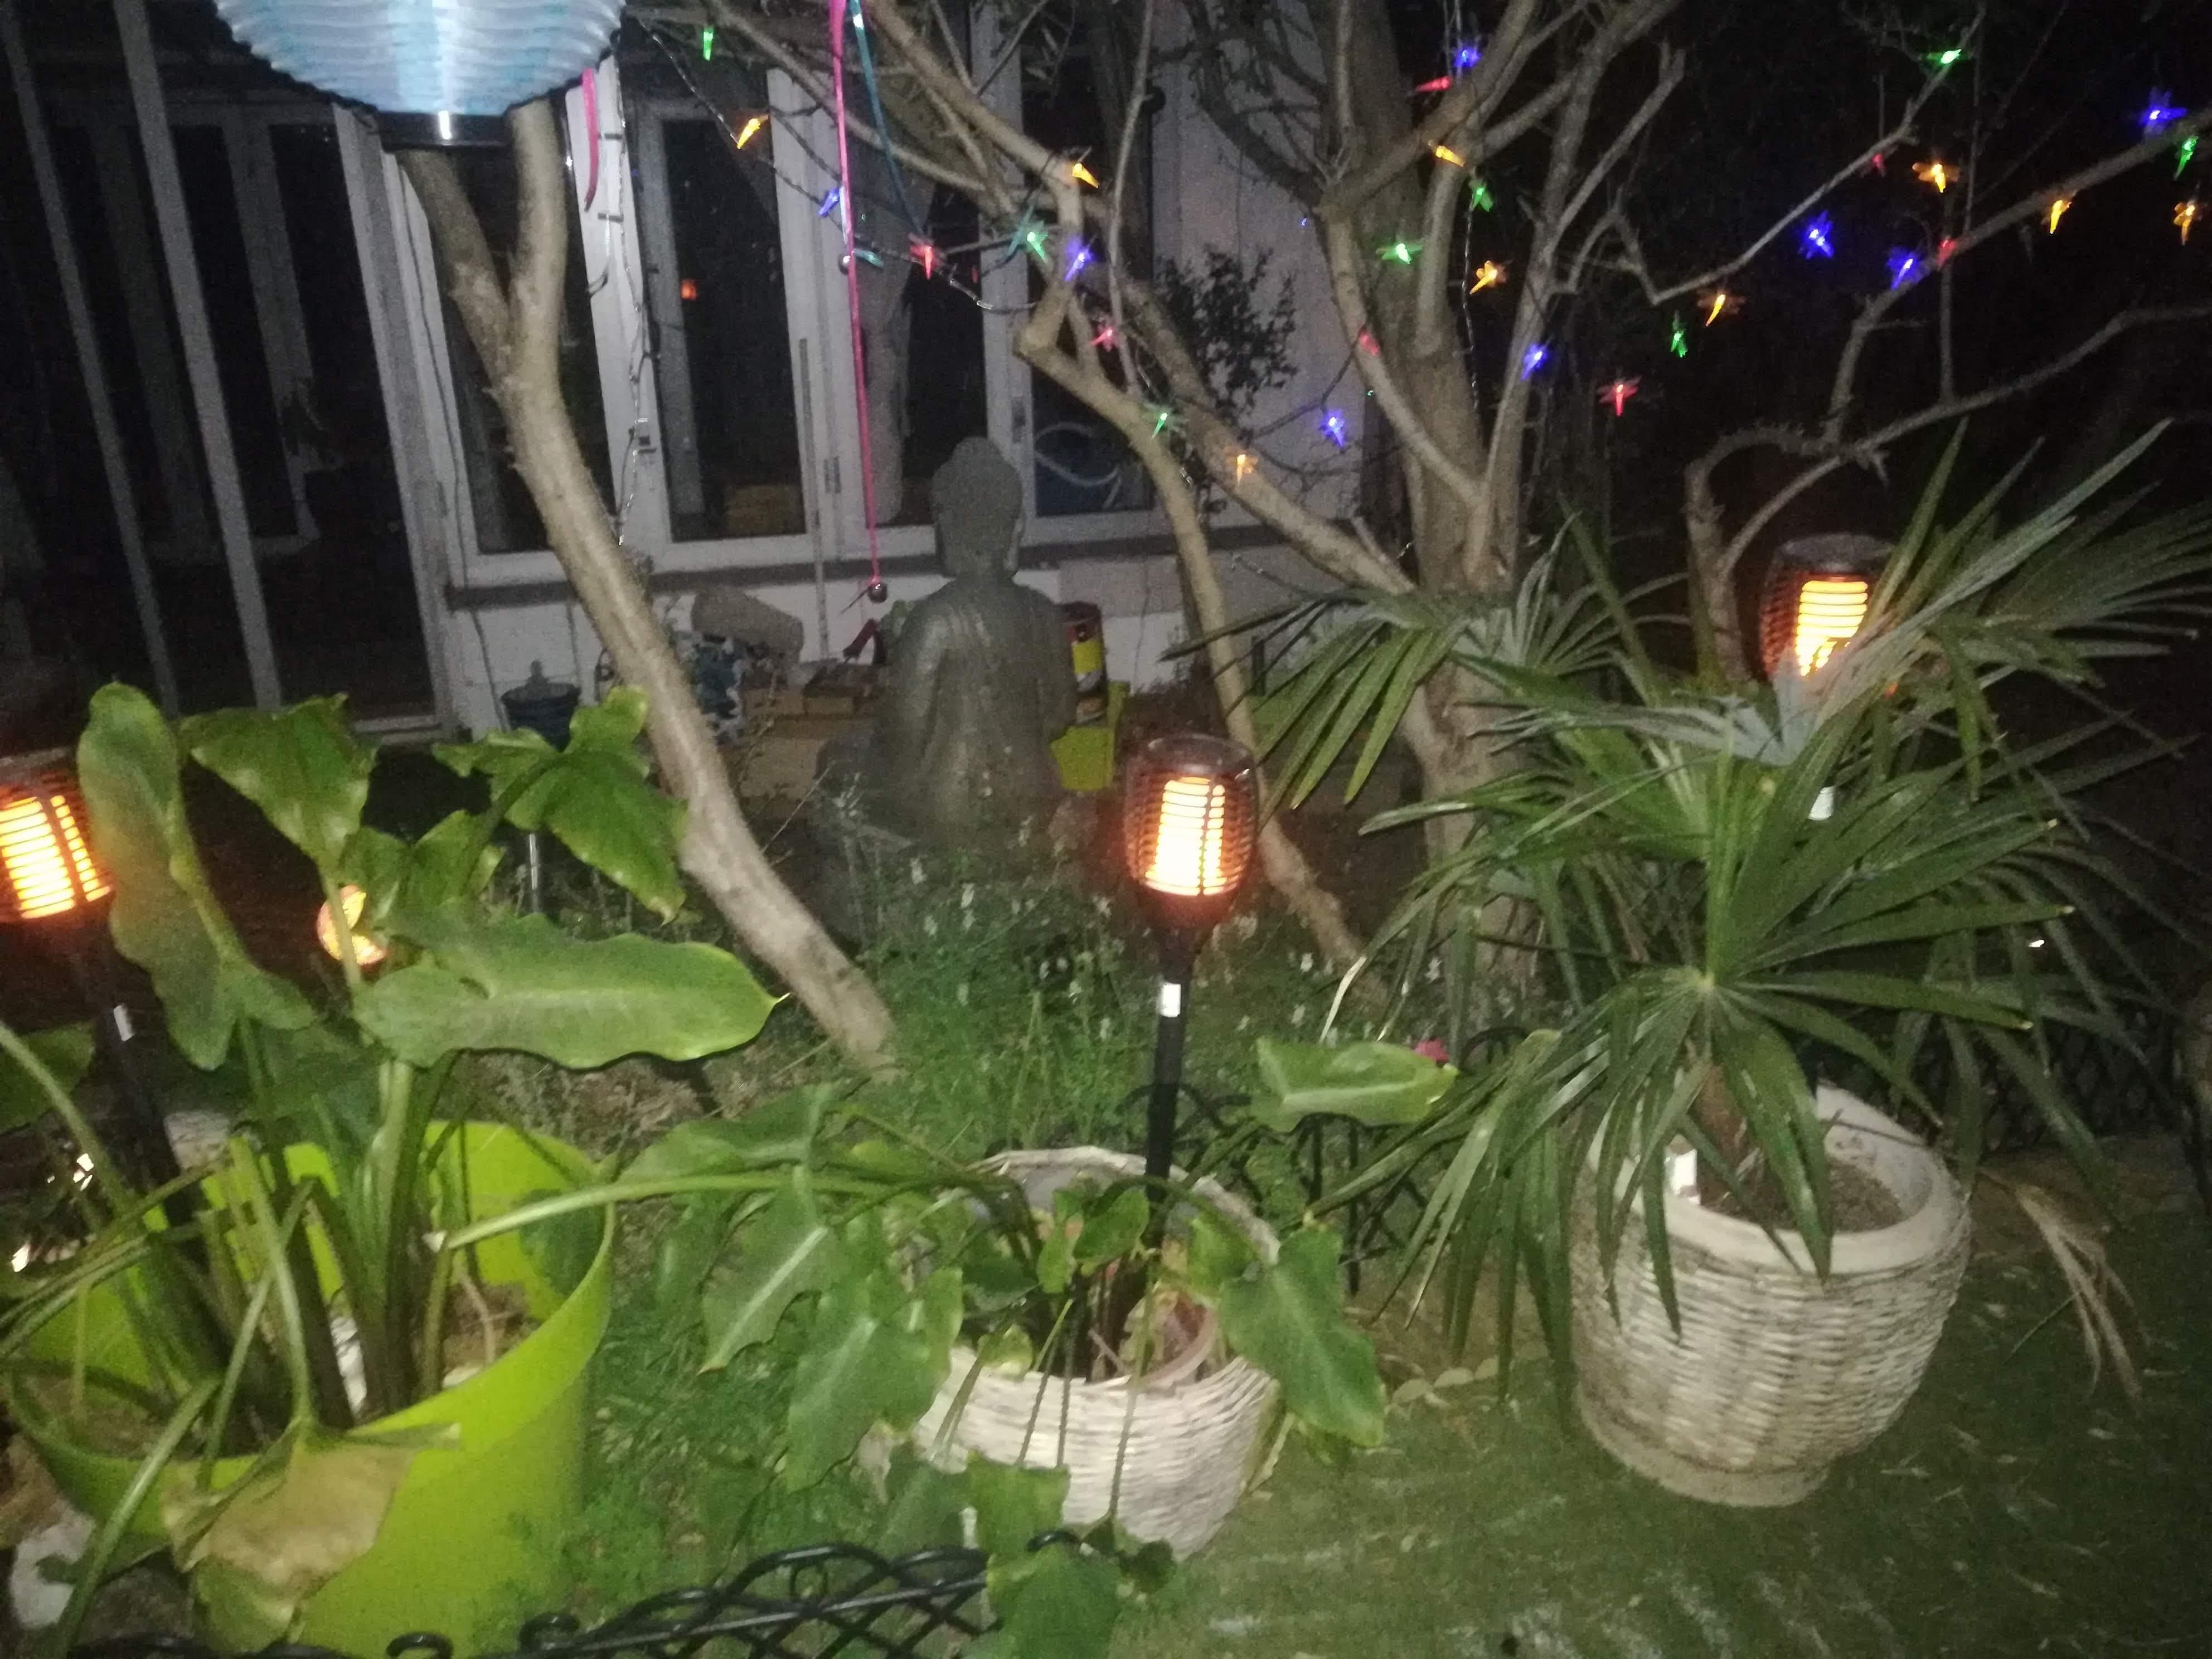 Jardin de nuit jpg